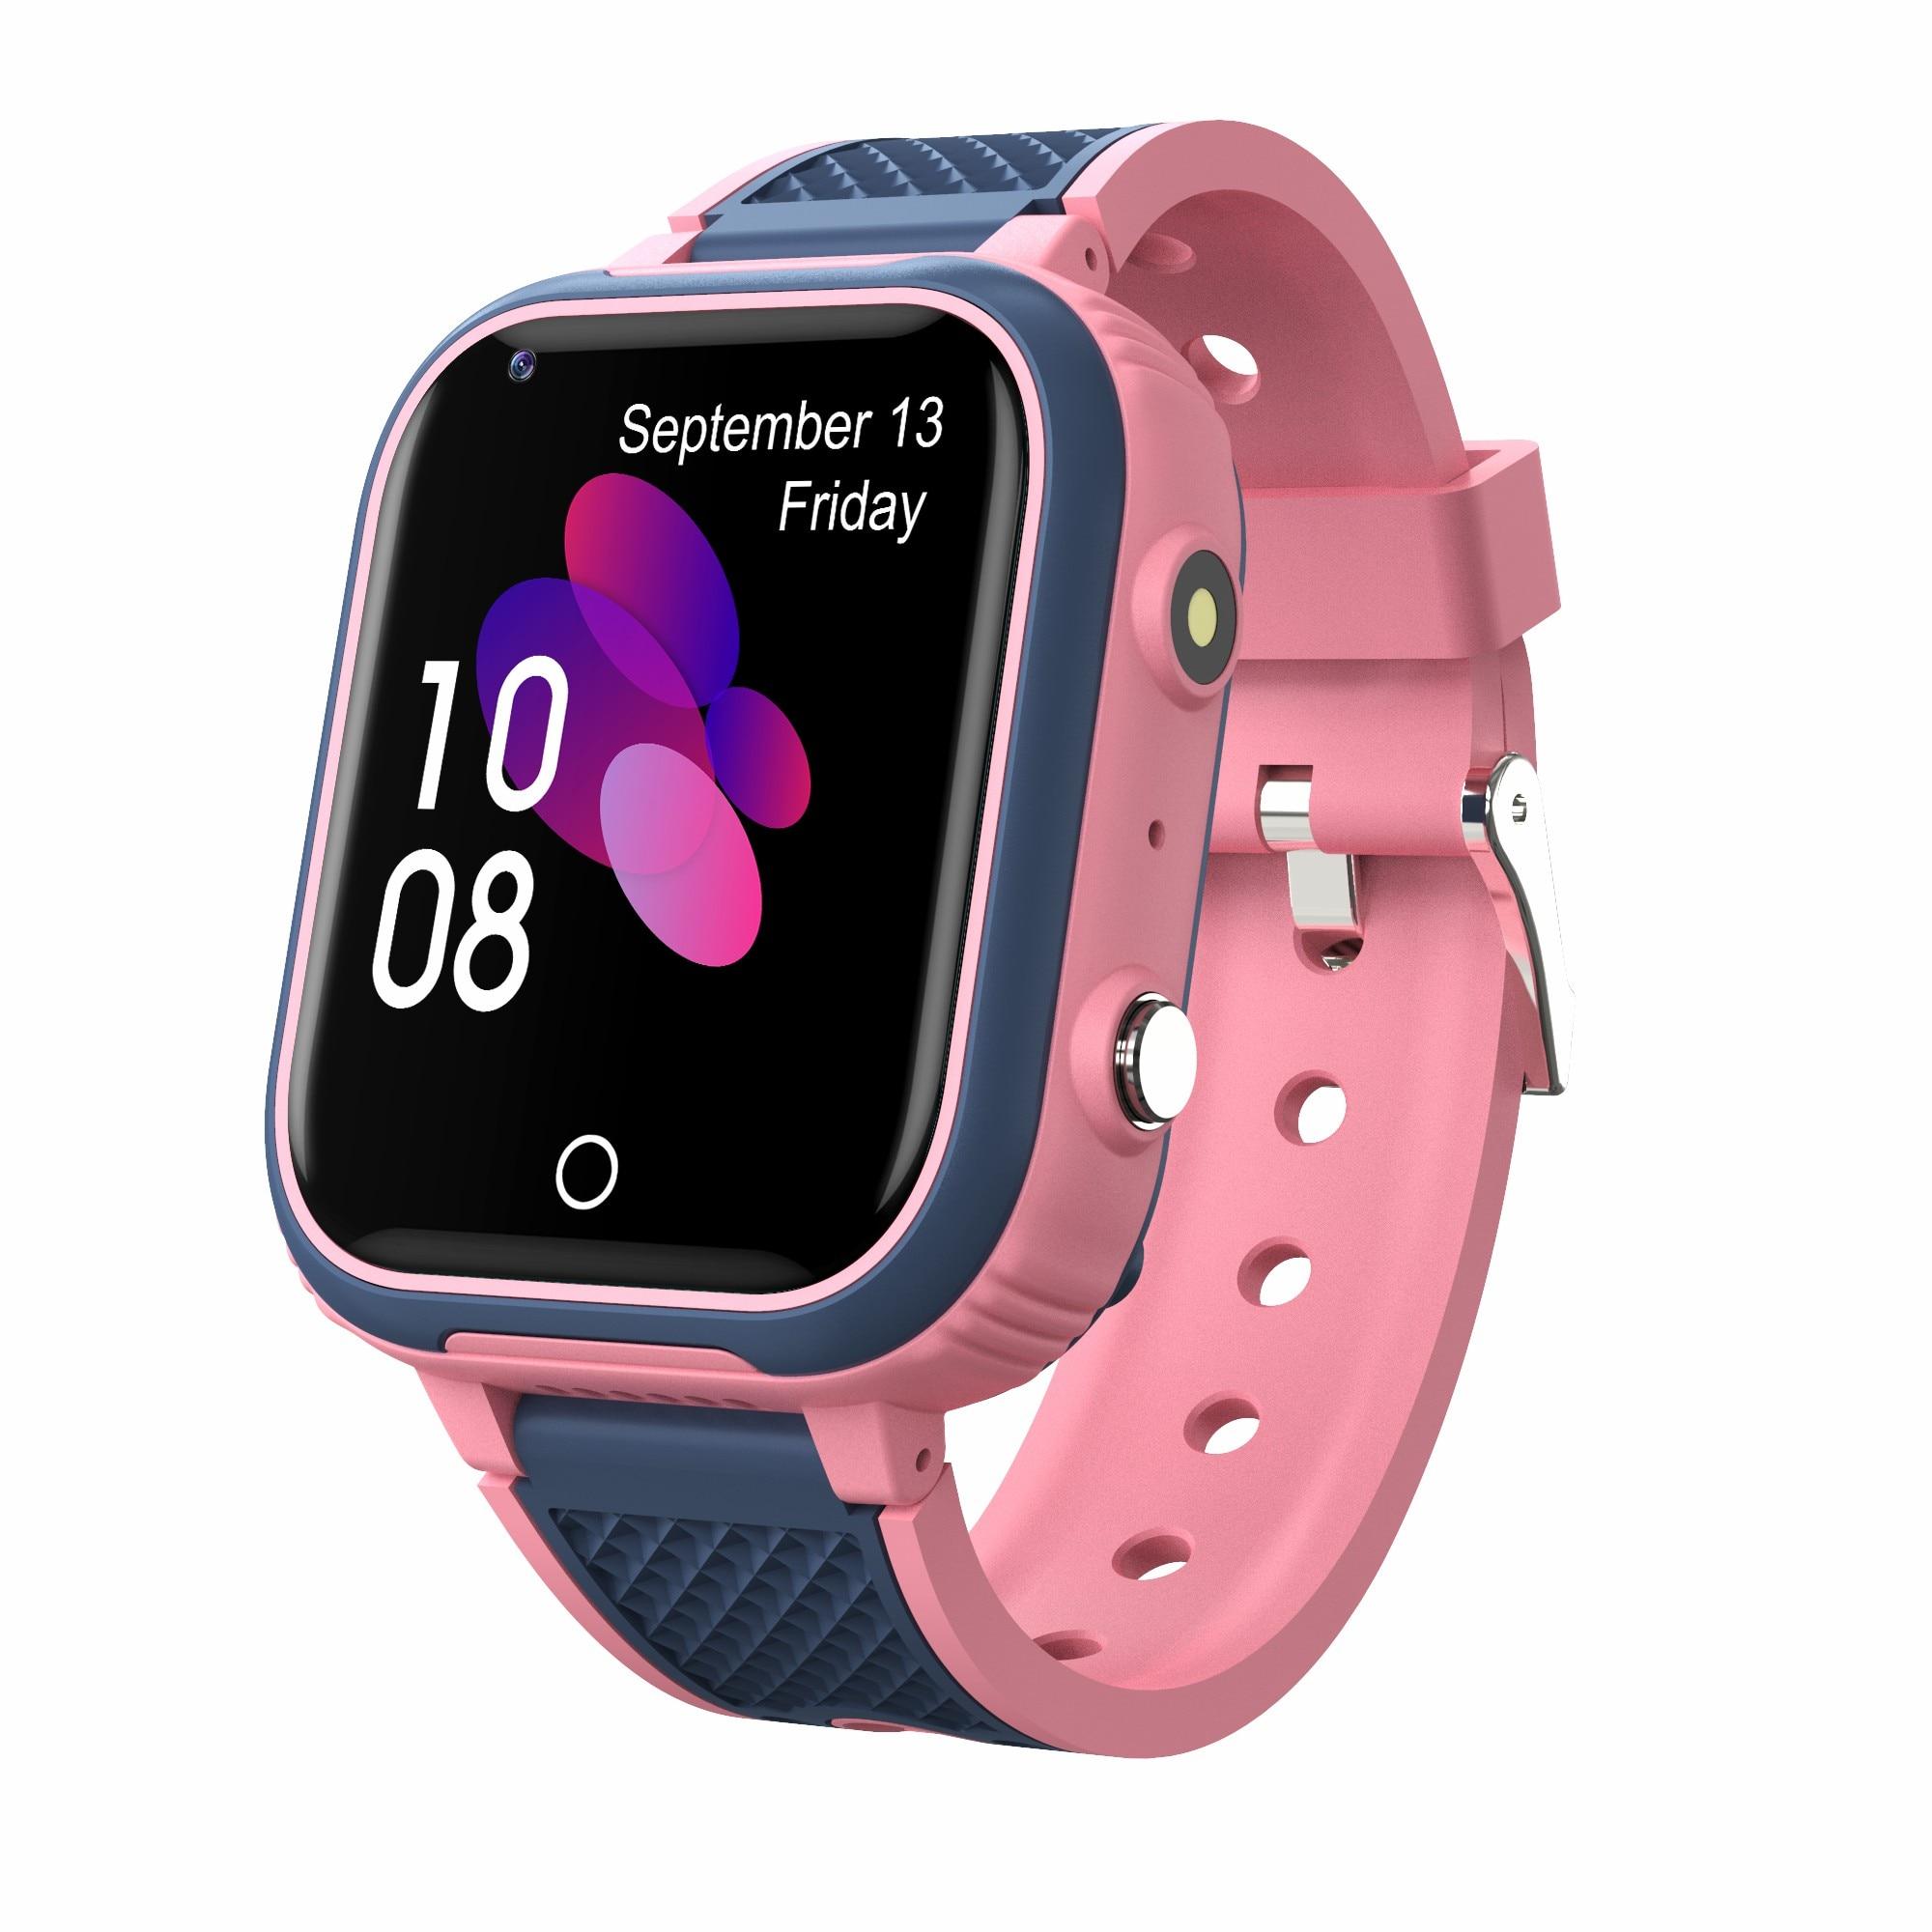 H62f2de287159413ba0f35e32b607a619M LT21 4G Smart Watch Kids GPS WIFI Video Call SOS IP67 Waterproof Child Smartwatch Camera Monitor Tracker Location Phone Watch